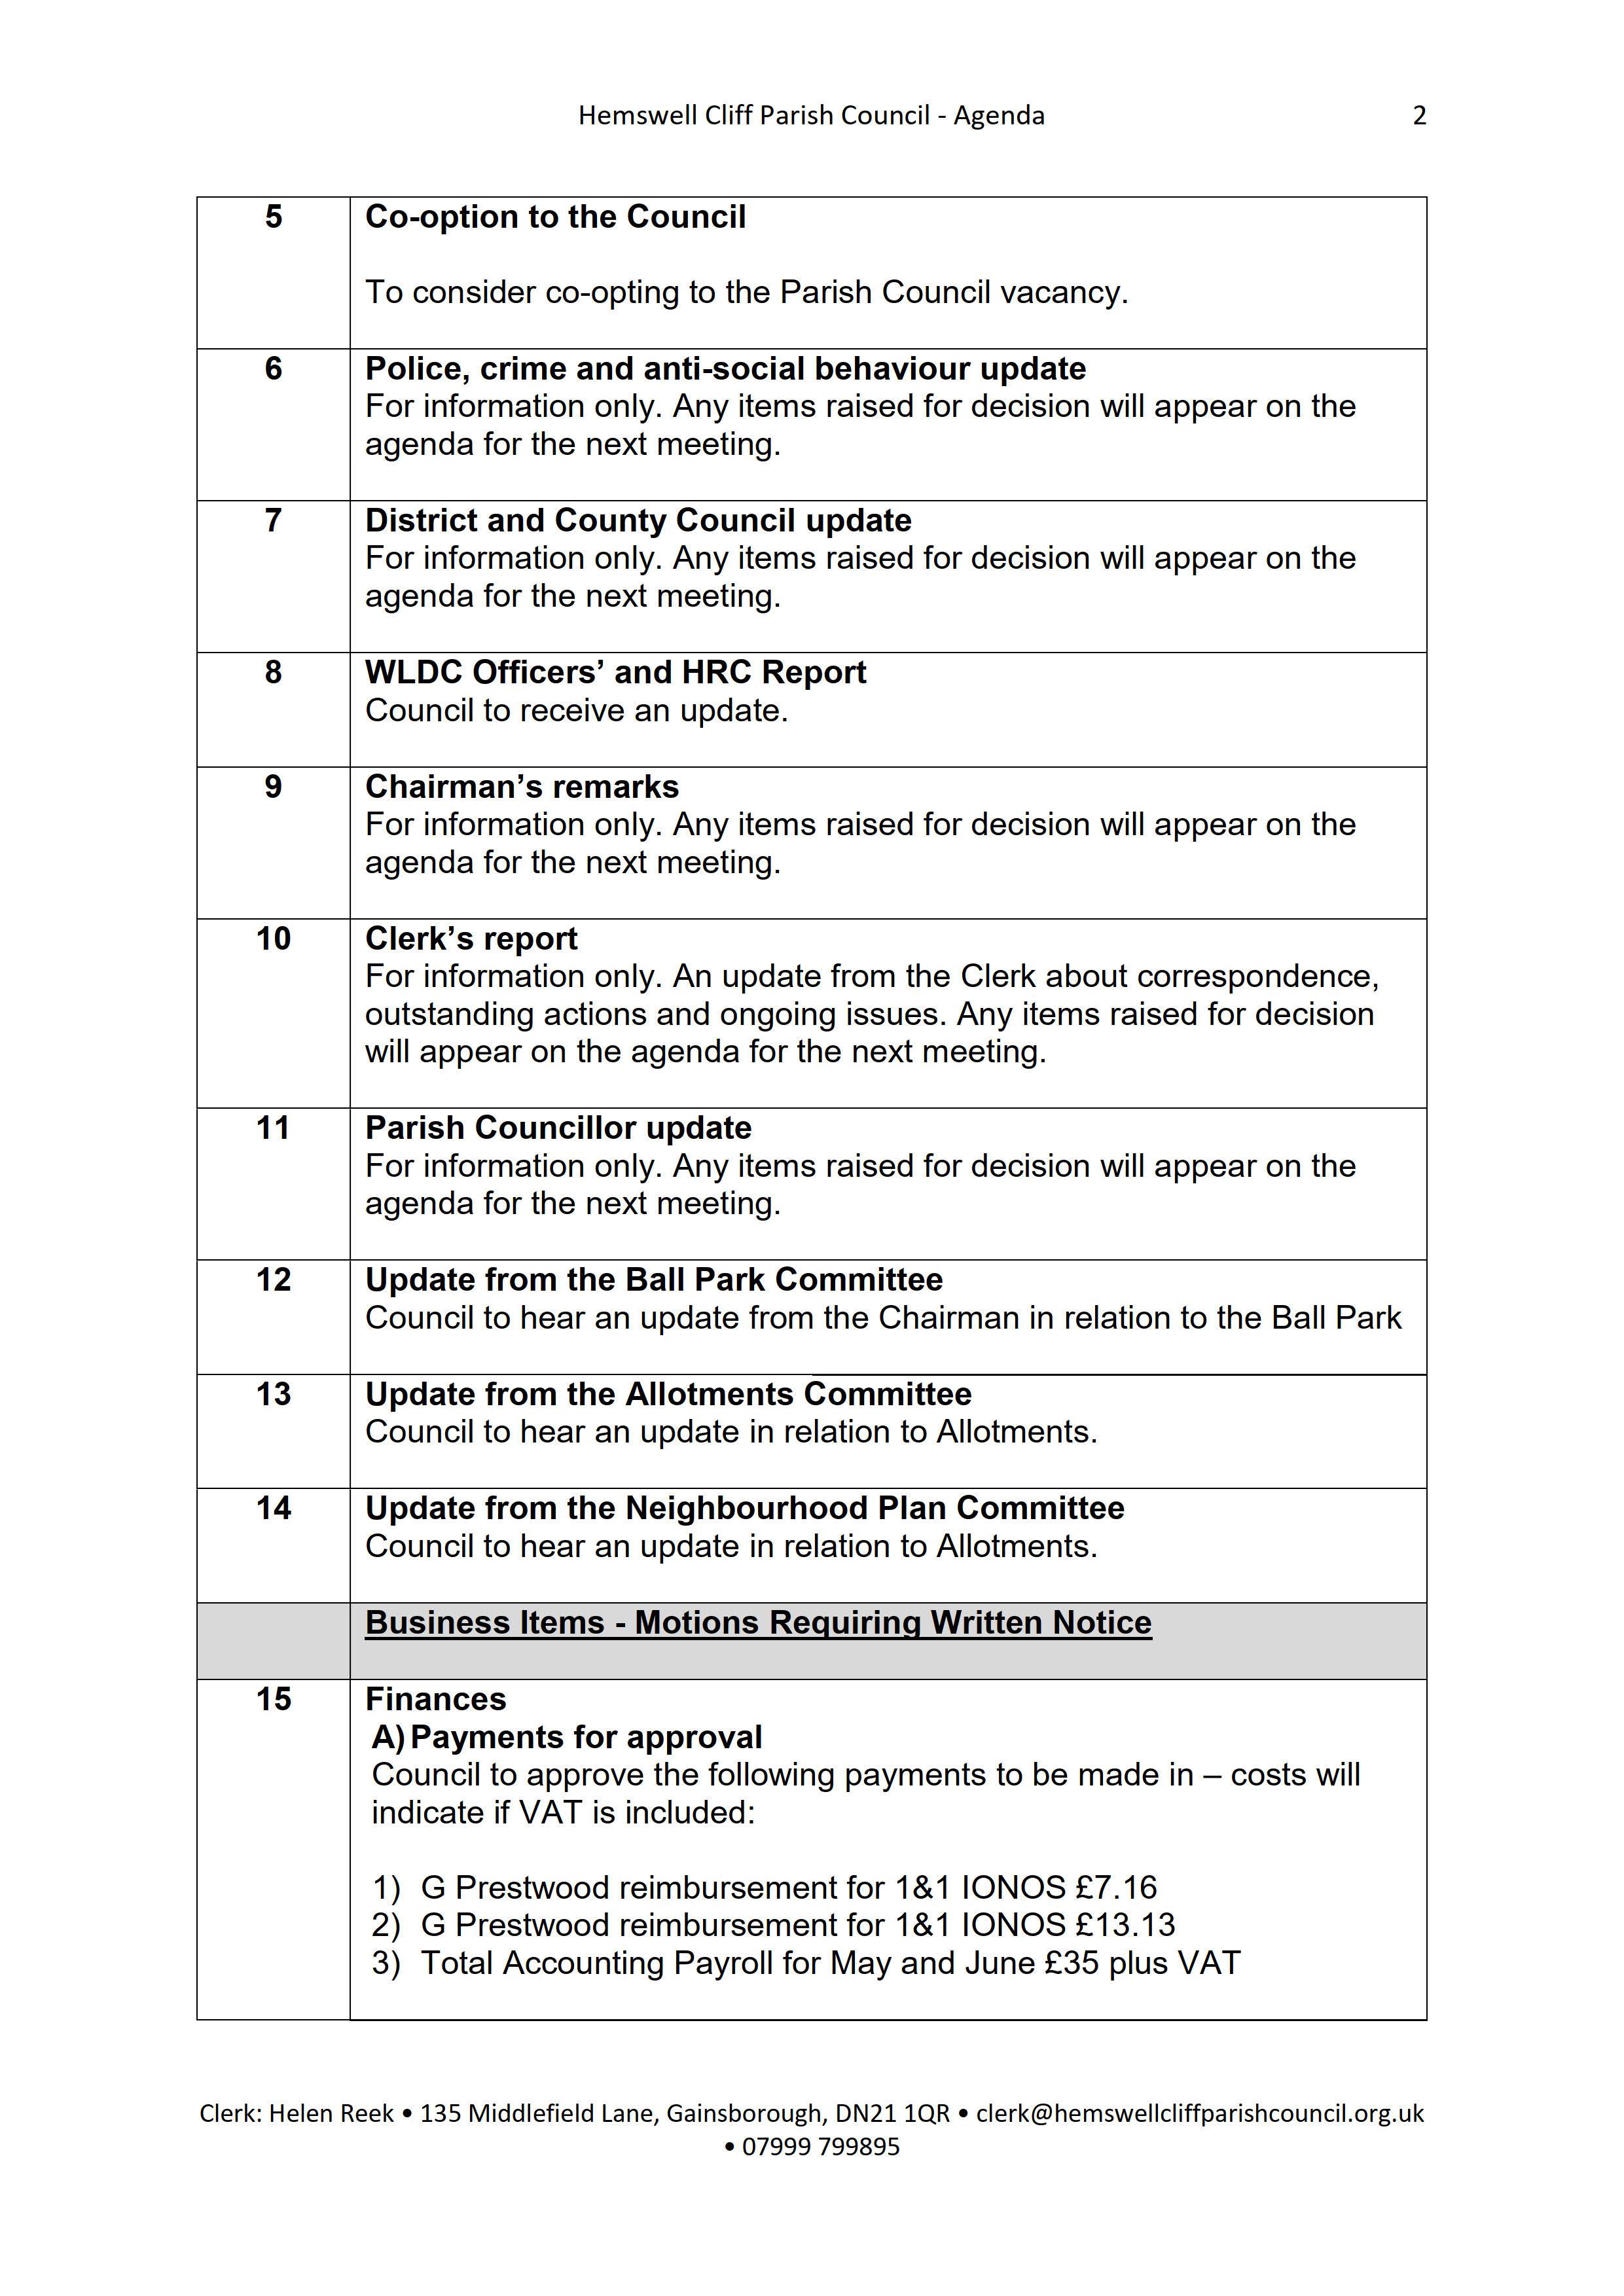 HCPC_Agenda_07.06.21_2.jpg